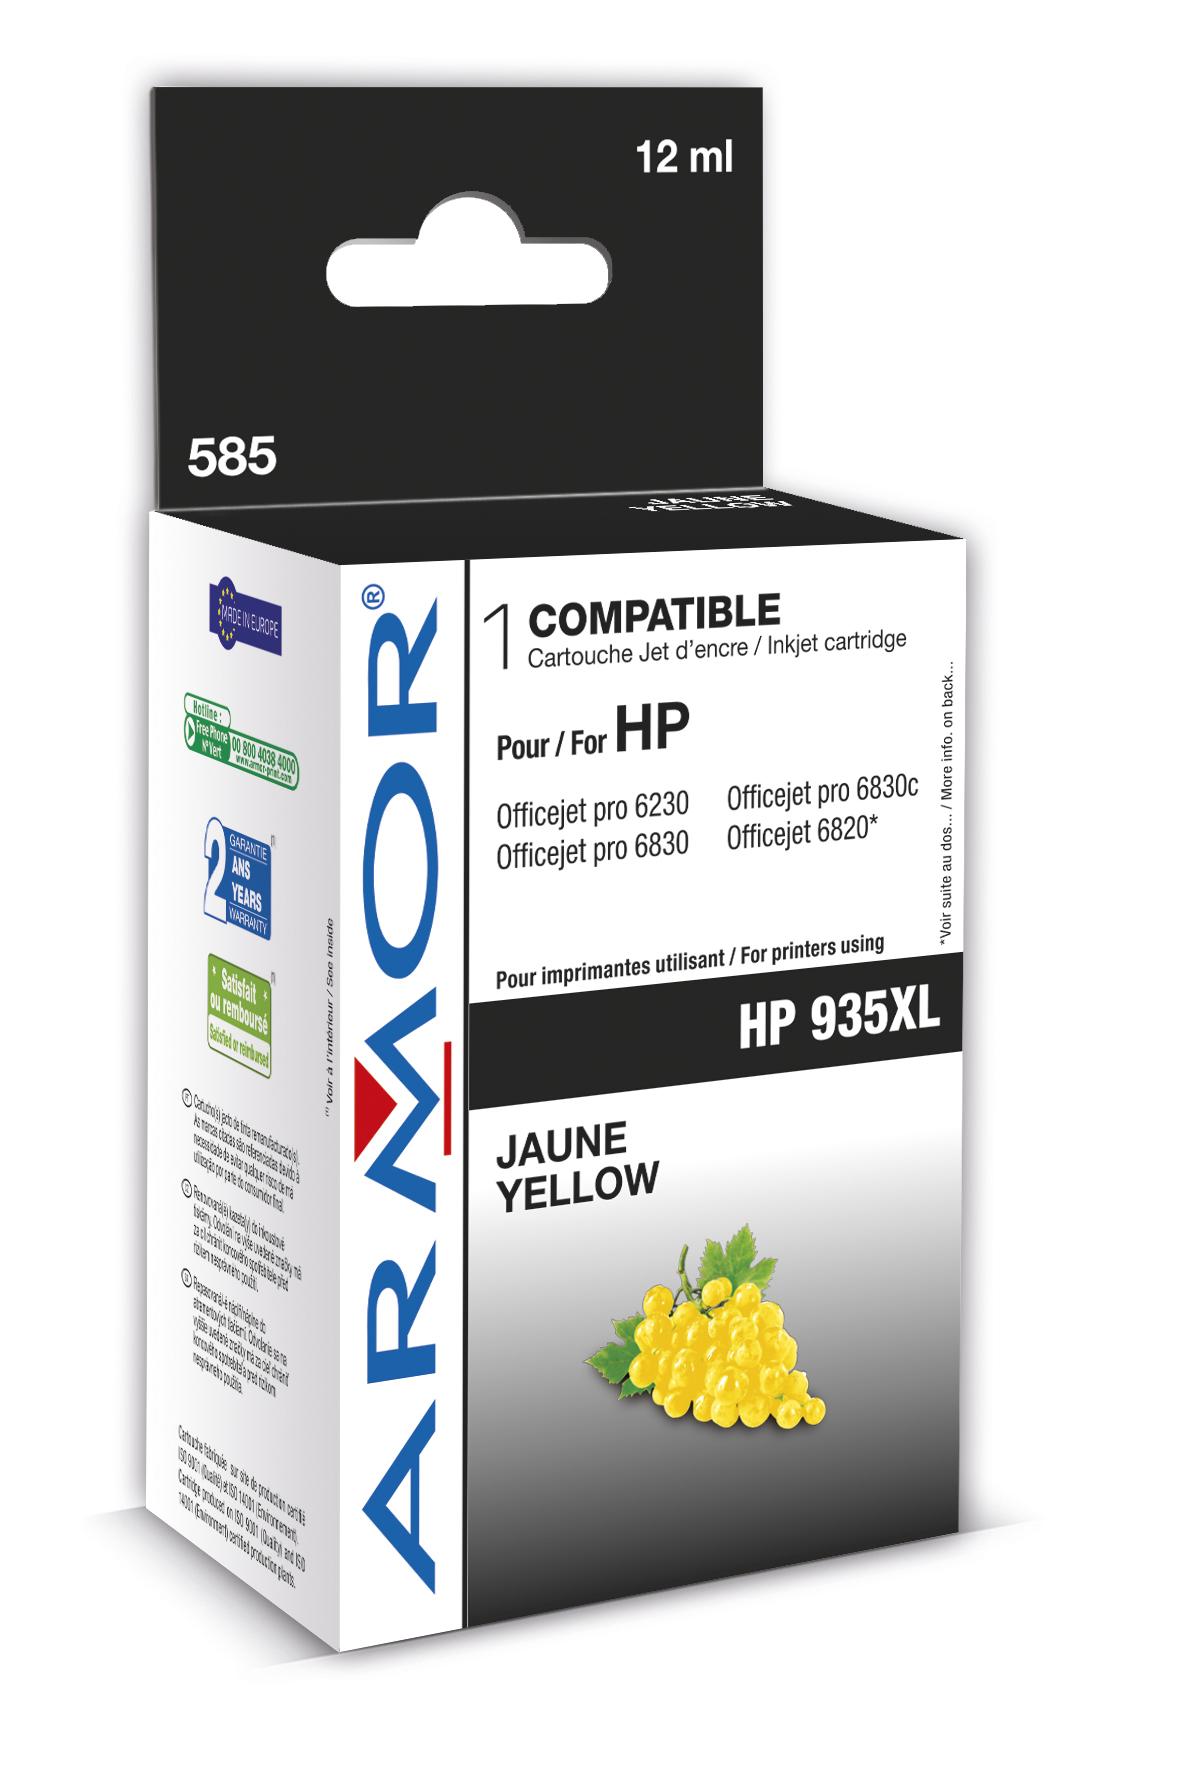 ARMOR cartridge pro HP OfficeJet 6830 yellow, 12 ml, kom.s C2P26AE